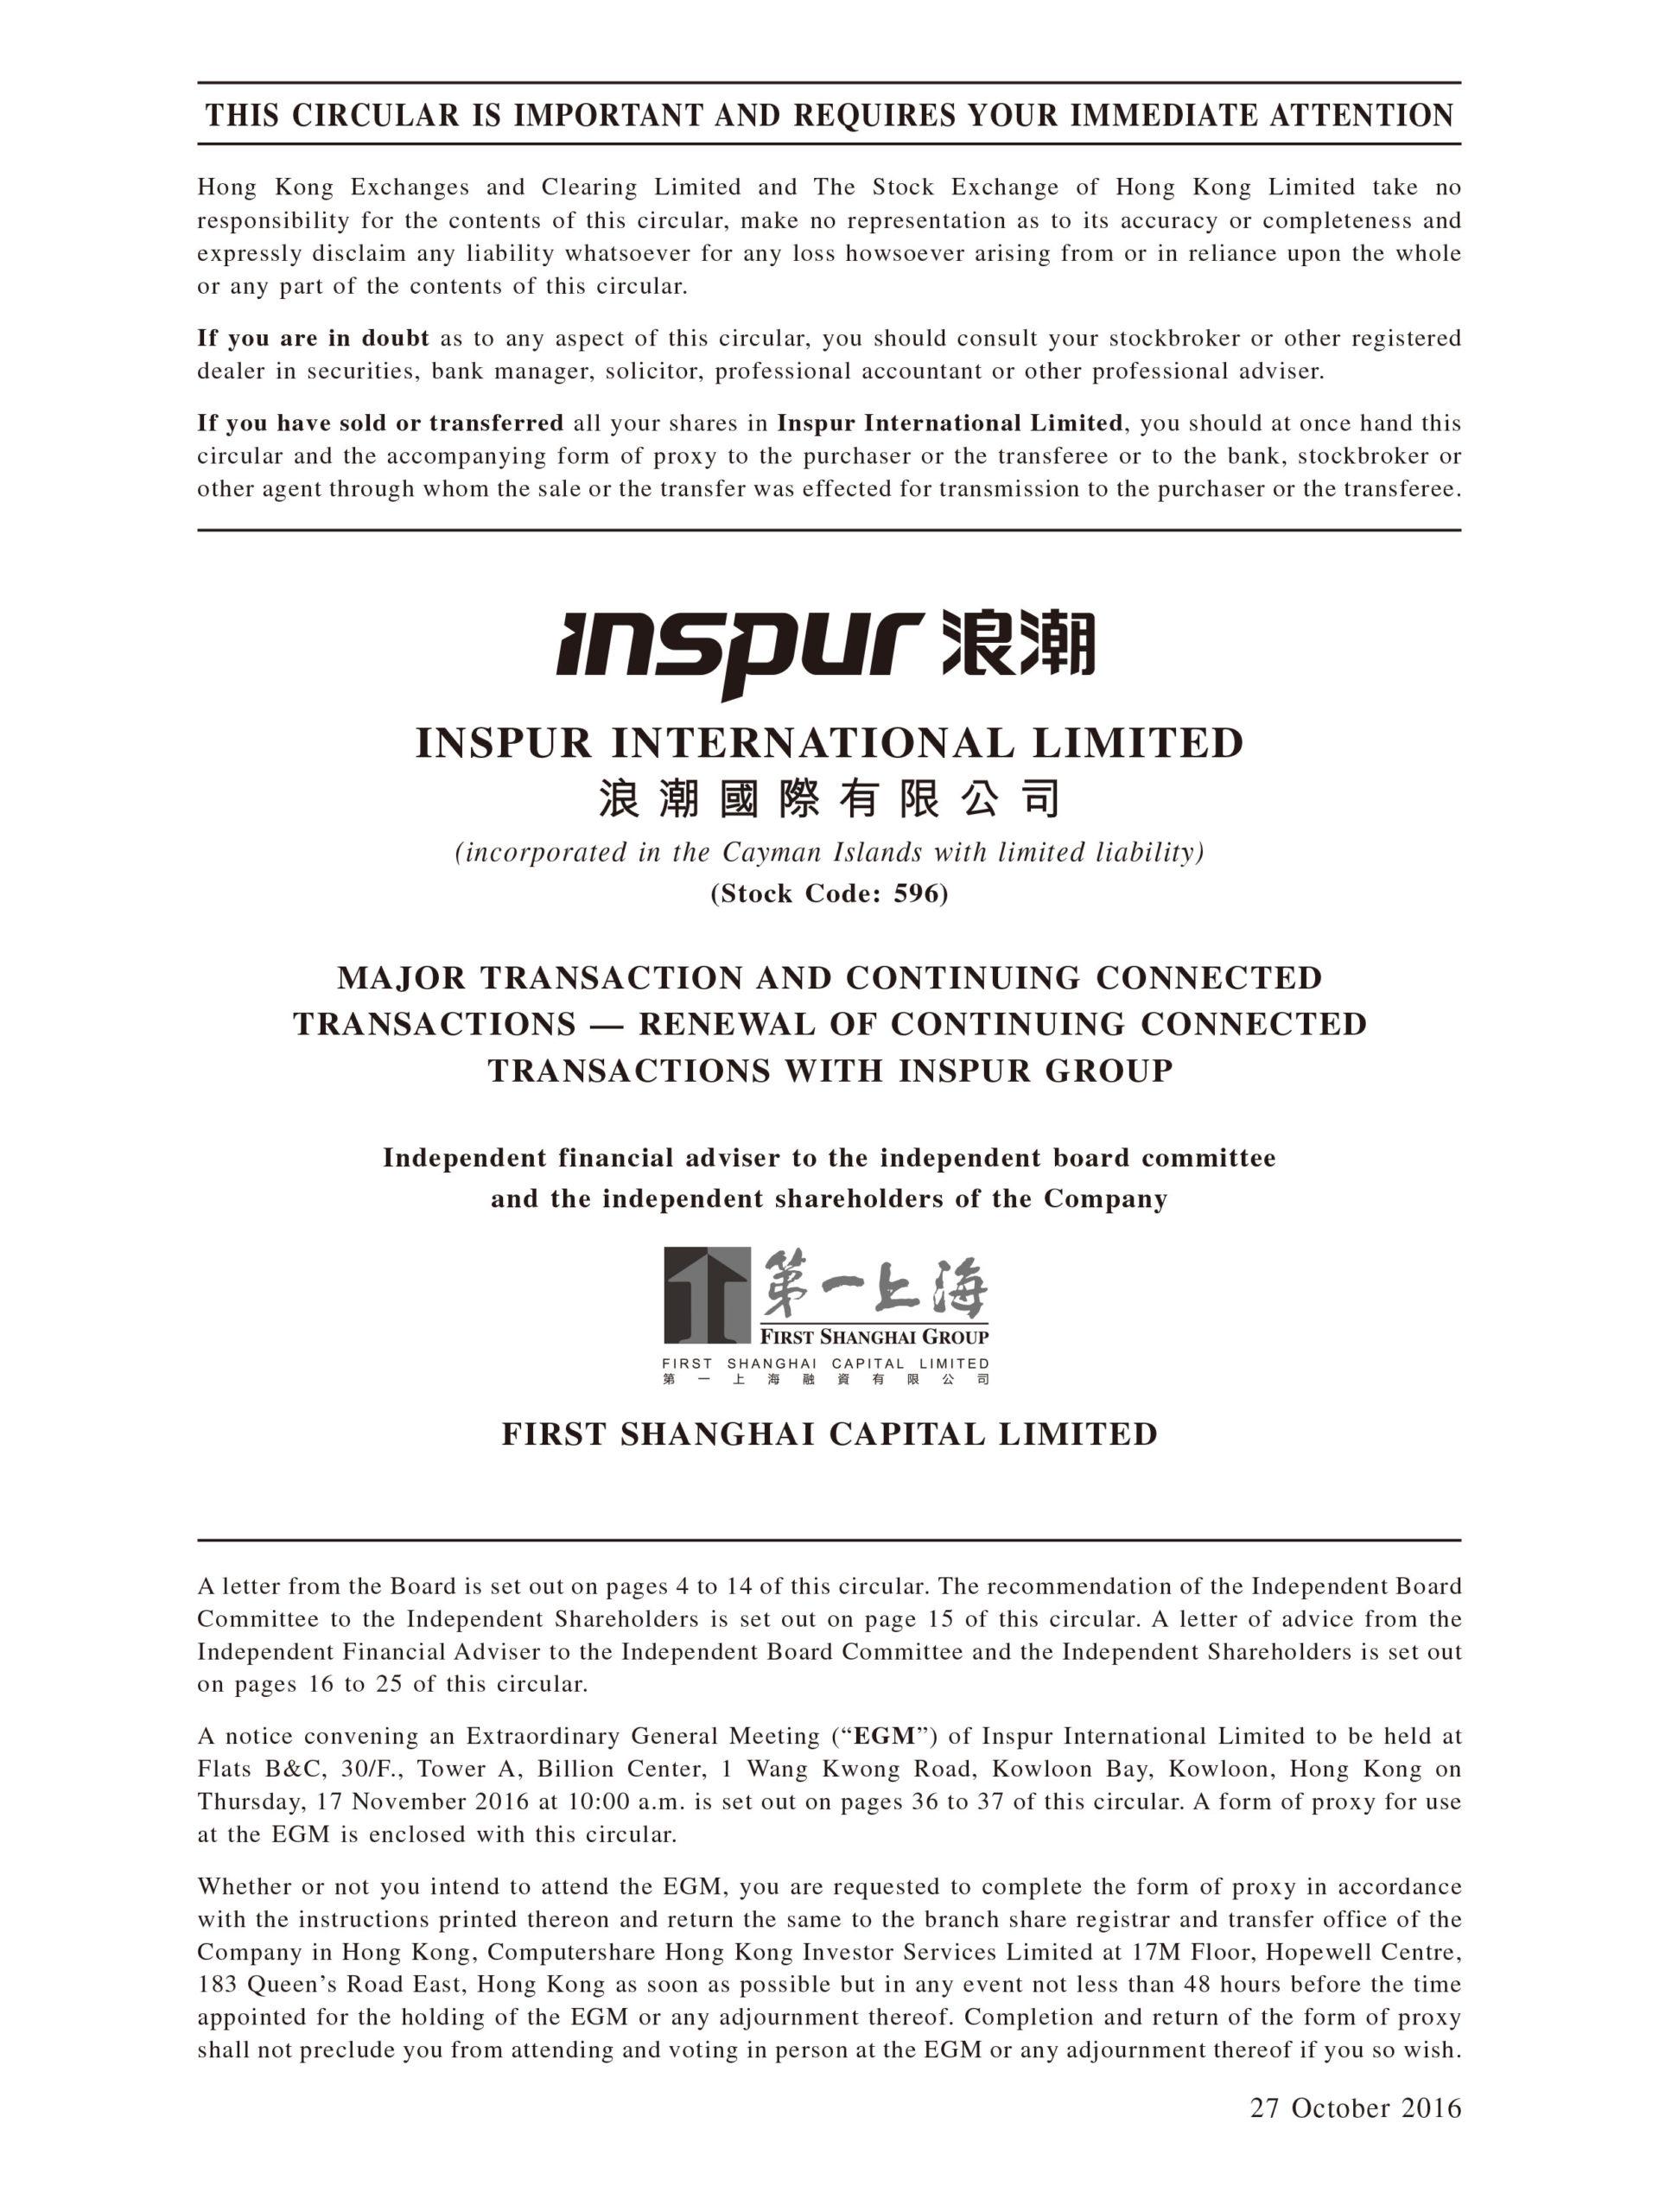 Inspur International Limited